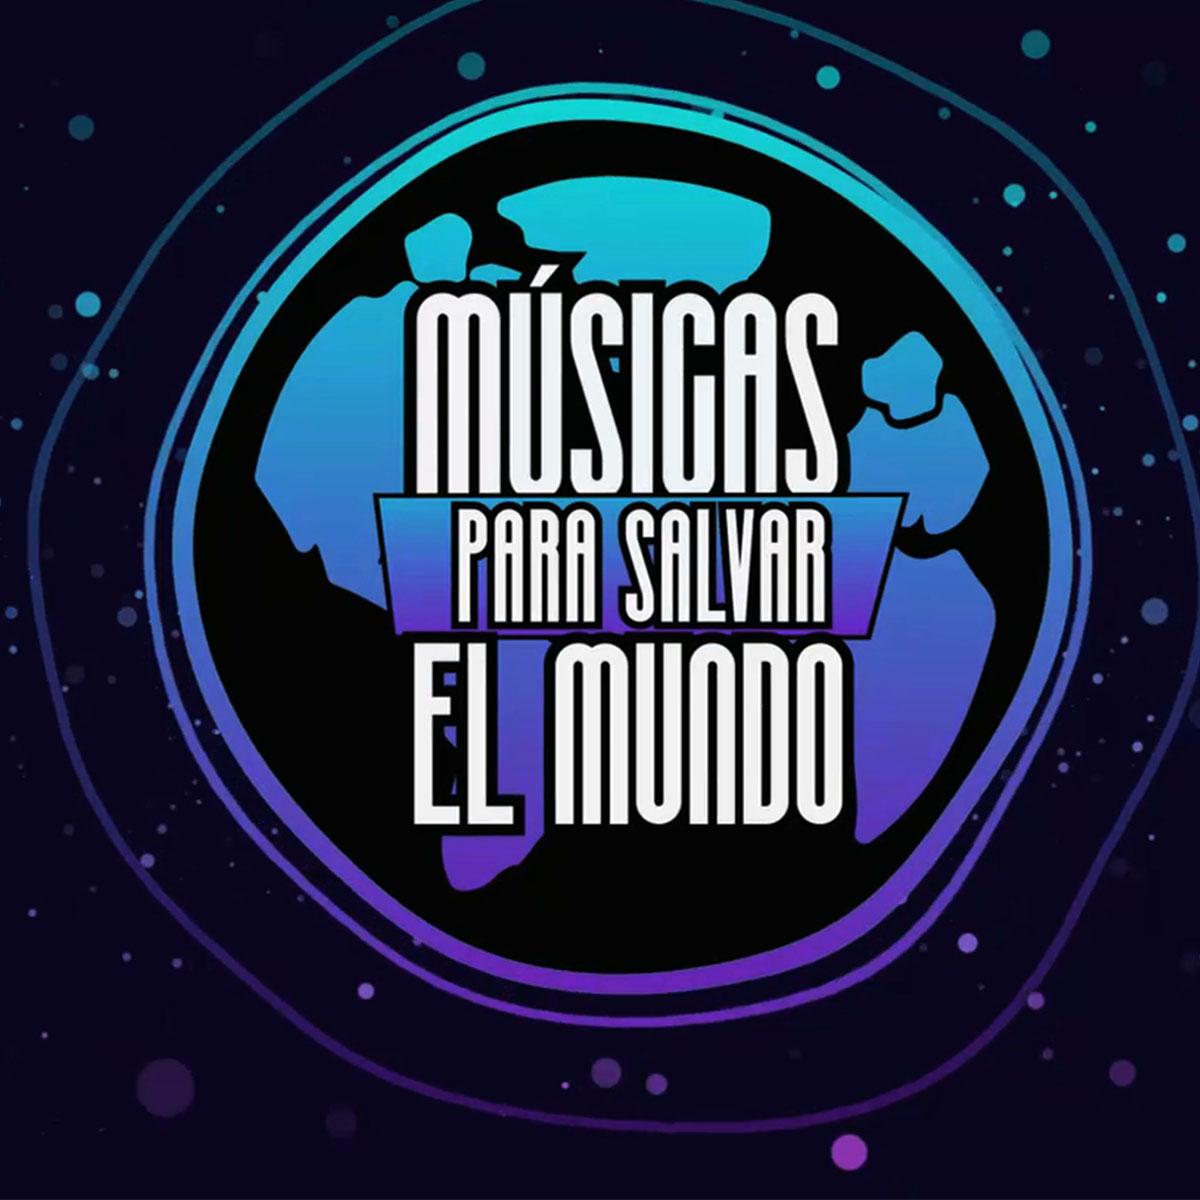 Musicas para salvar el mundo 1